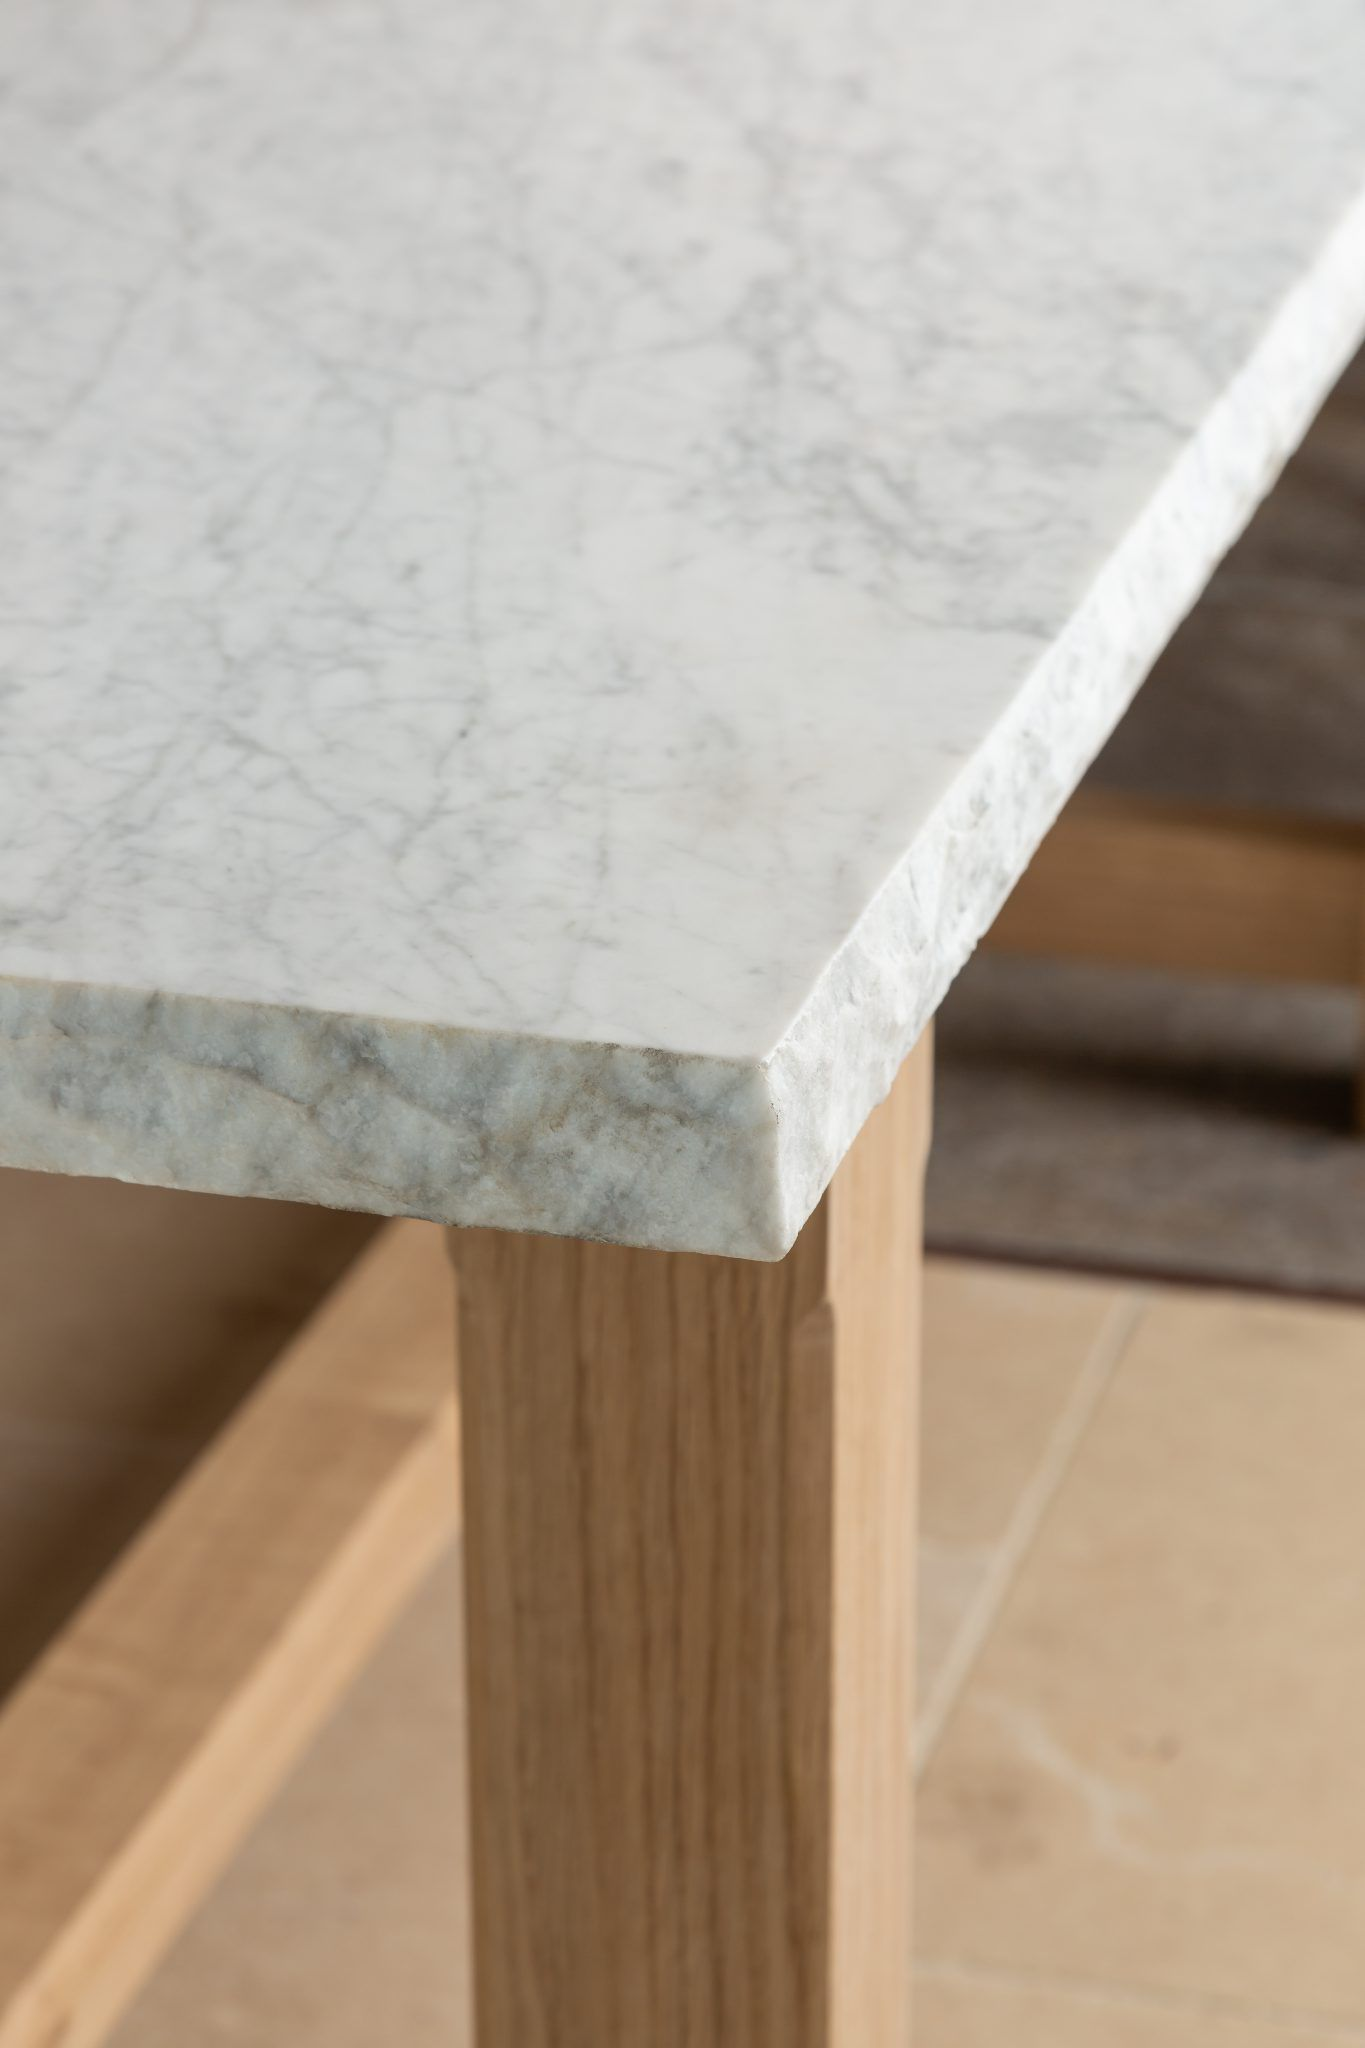 corner of table